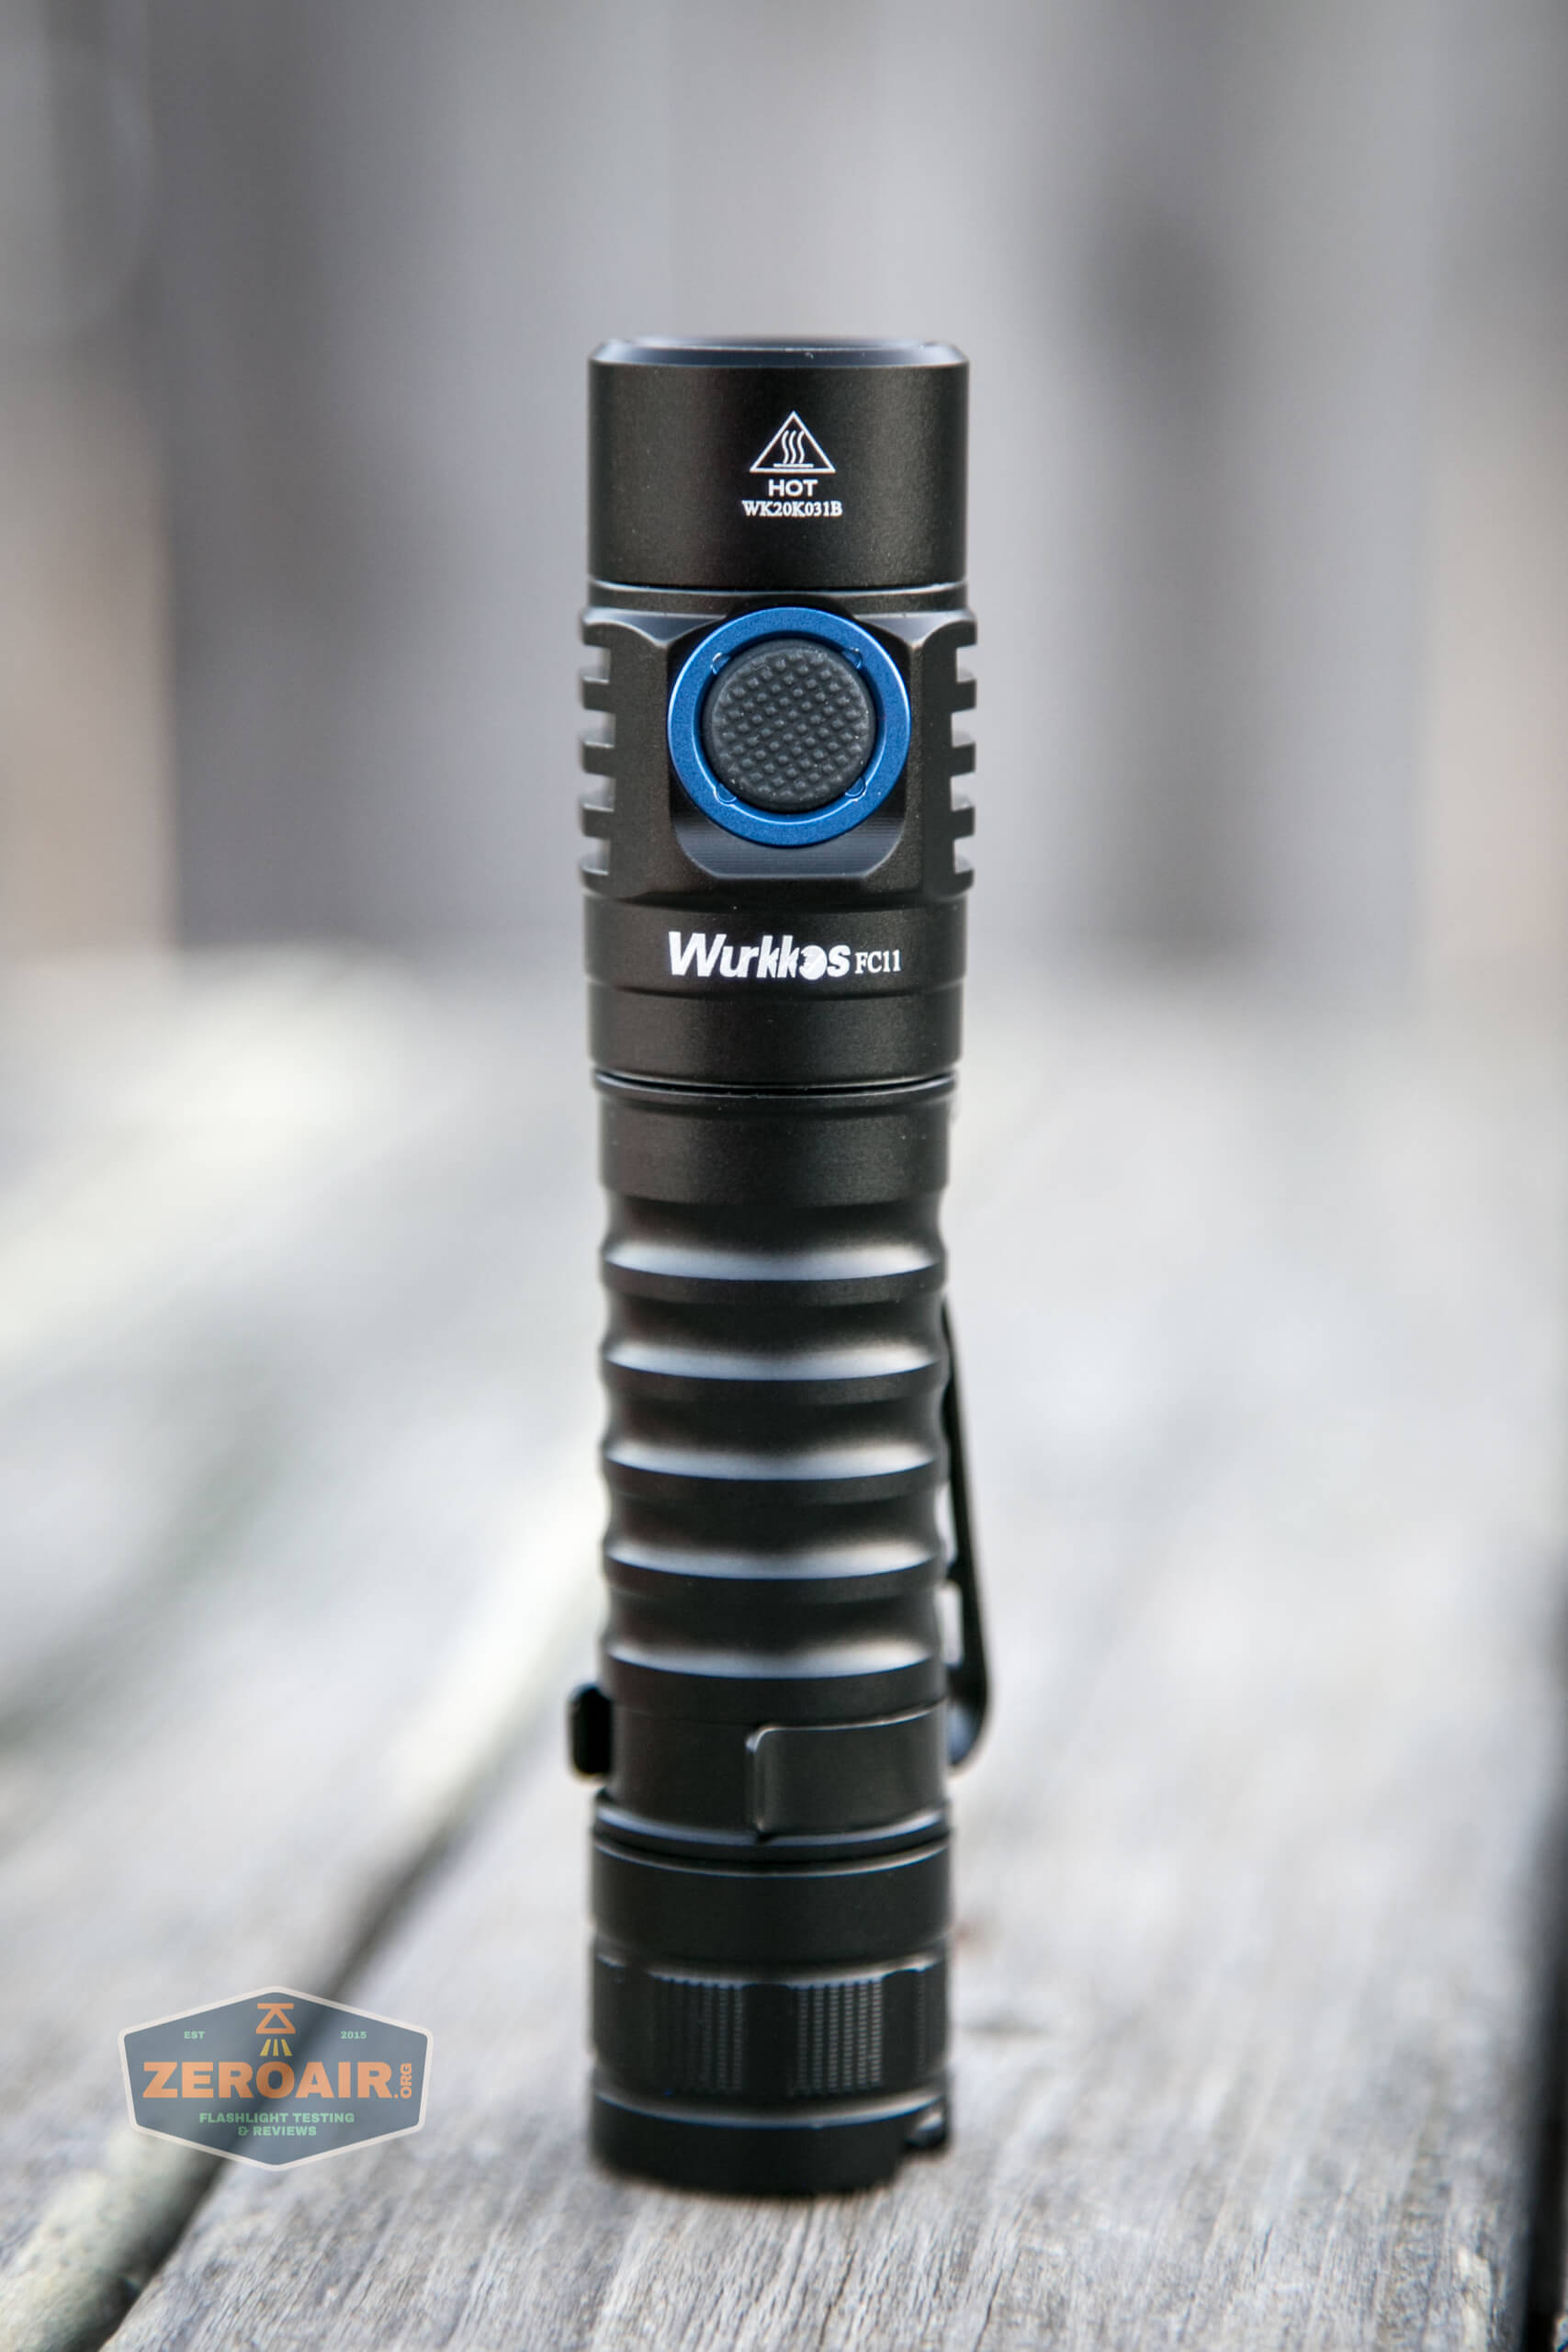 wurkkos fc11 flashlight standing